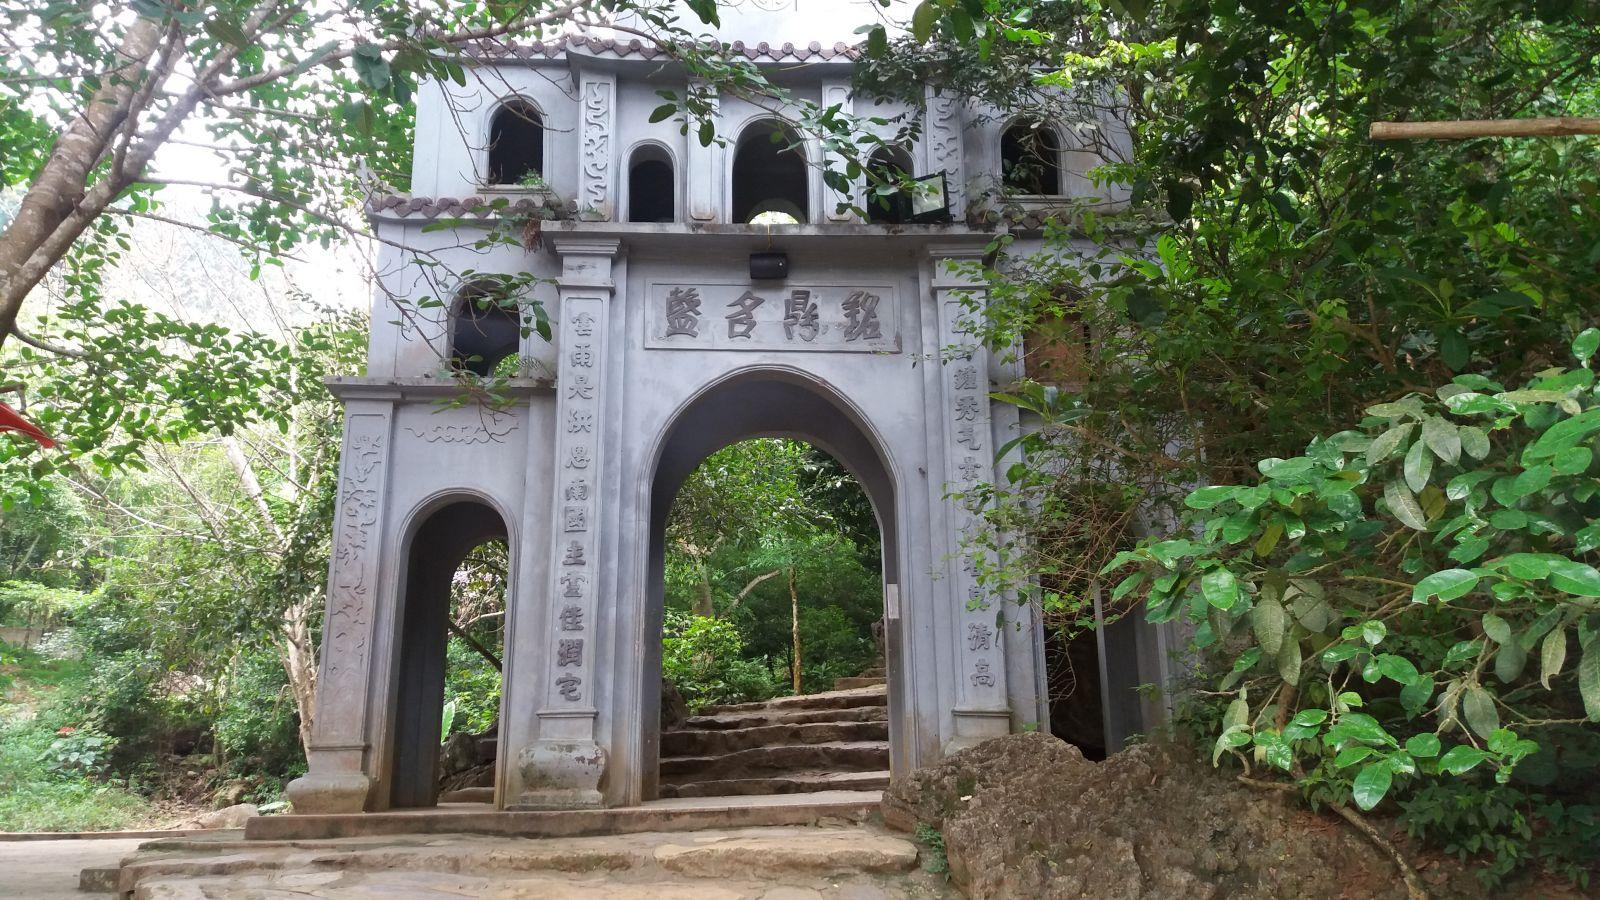 Bai Dinh Pagoda- the ancient area gate